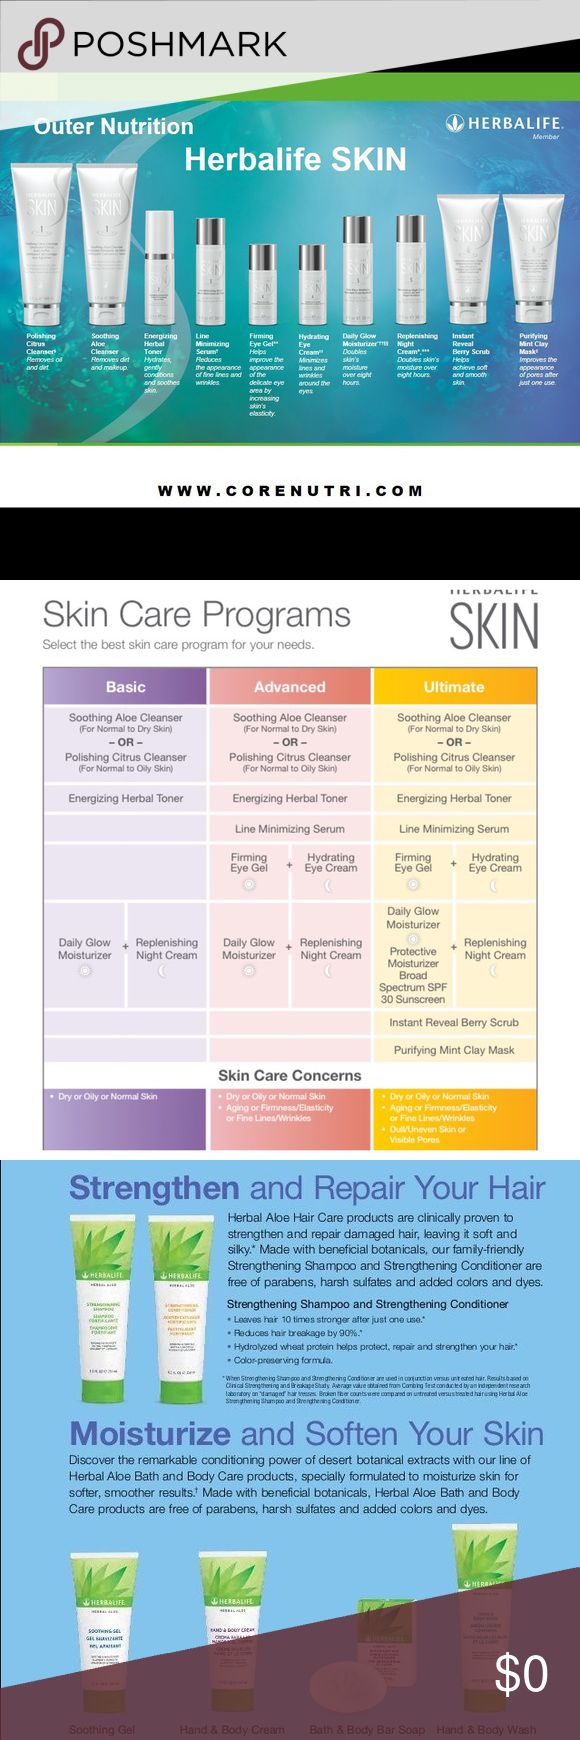 Care herbal life product skin - Herbalife Skin Products Normal Dry Oily Skin Herbalife Skin Is Solution Based